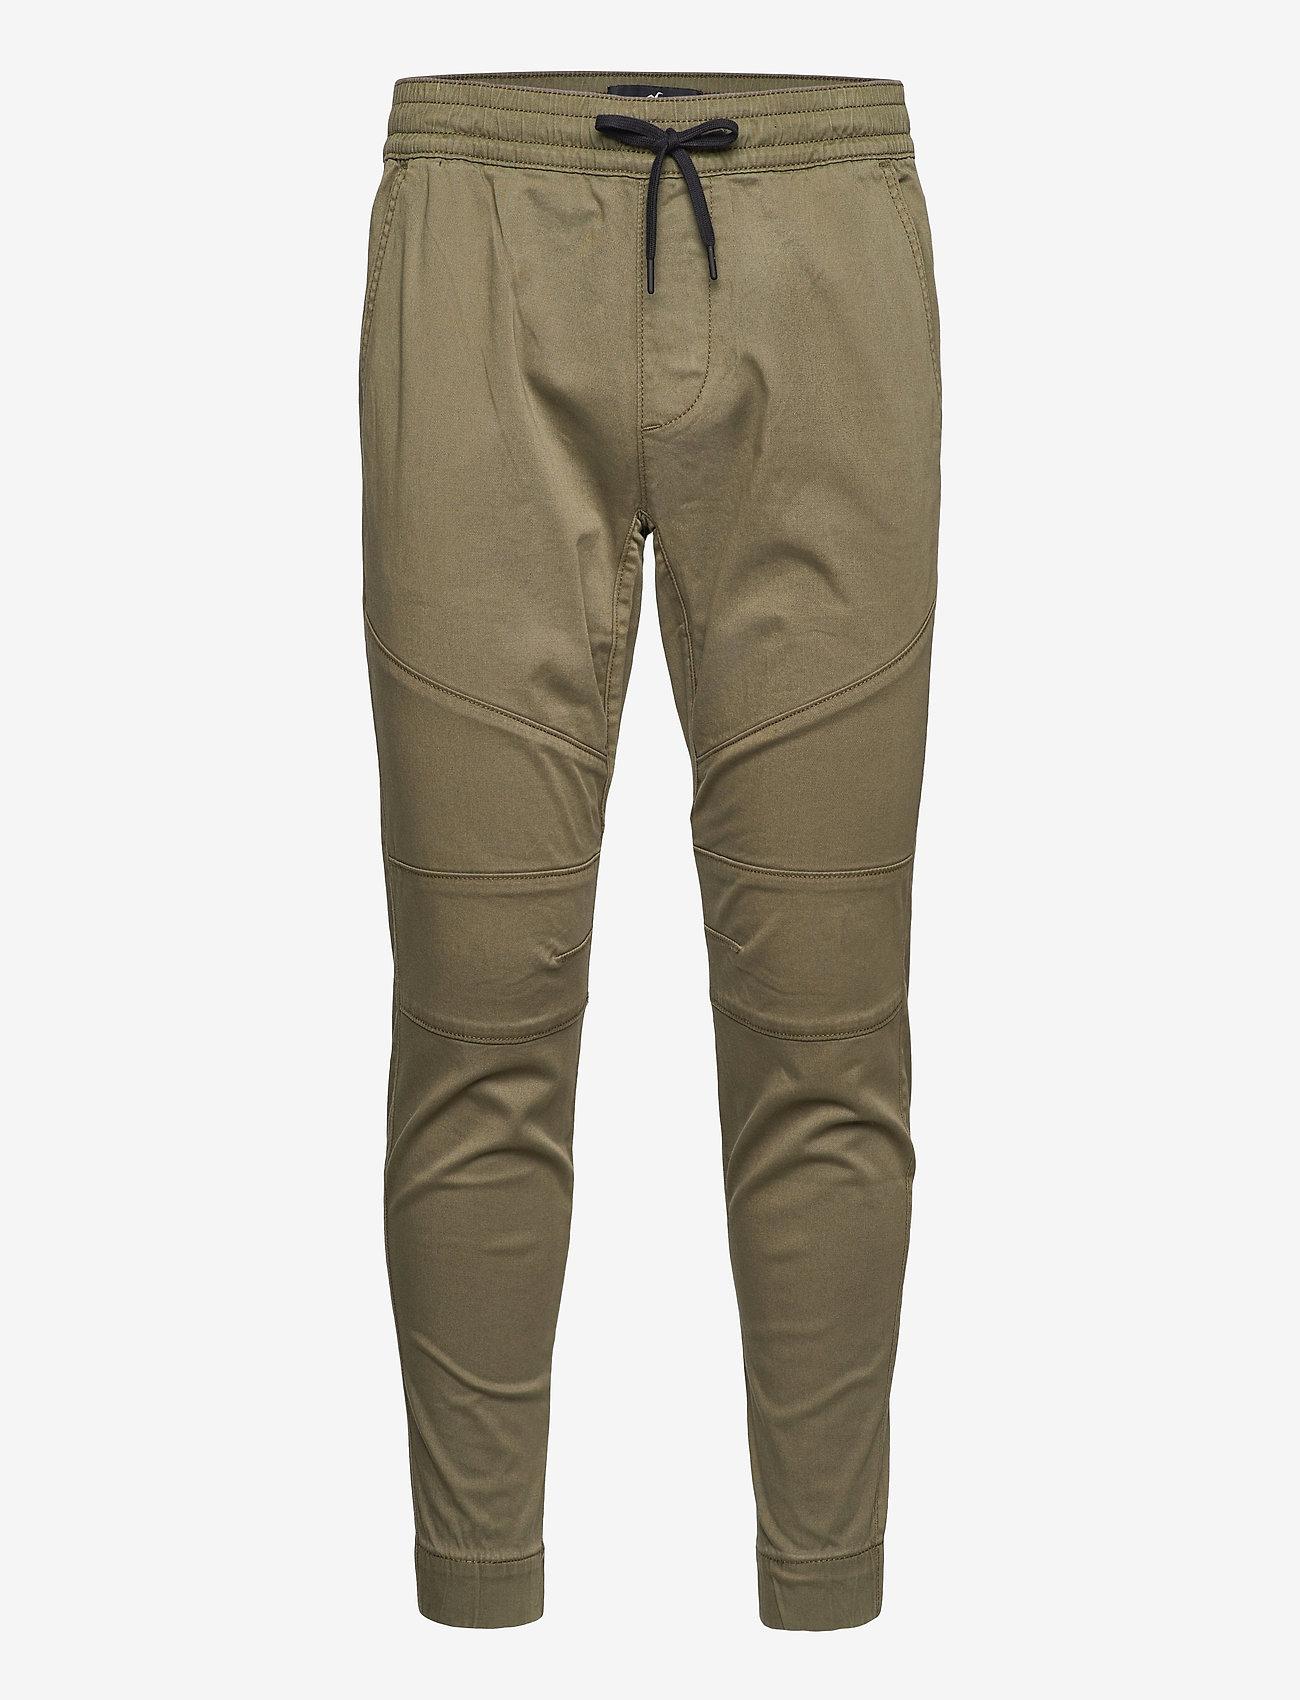 Hollister - HCo. GUYS PANTS - bottoms - olive skinny jogger - 0